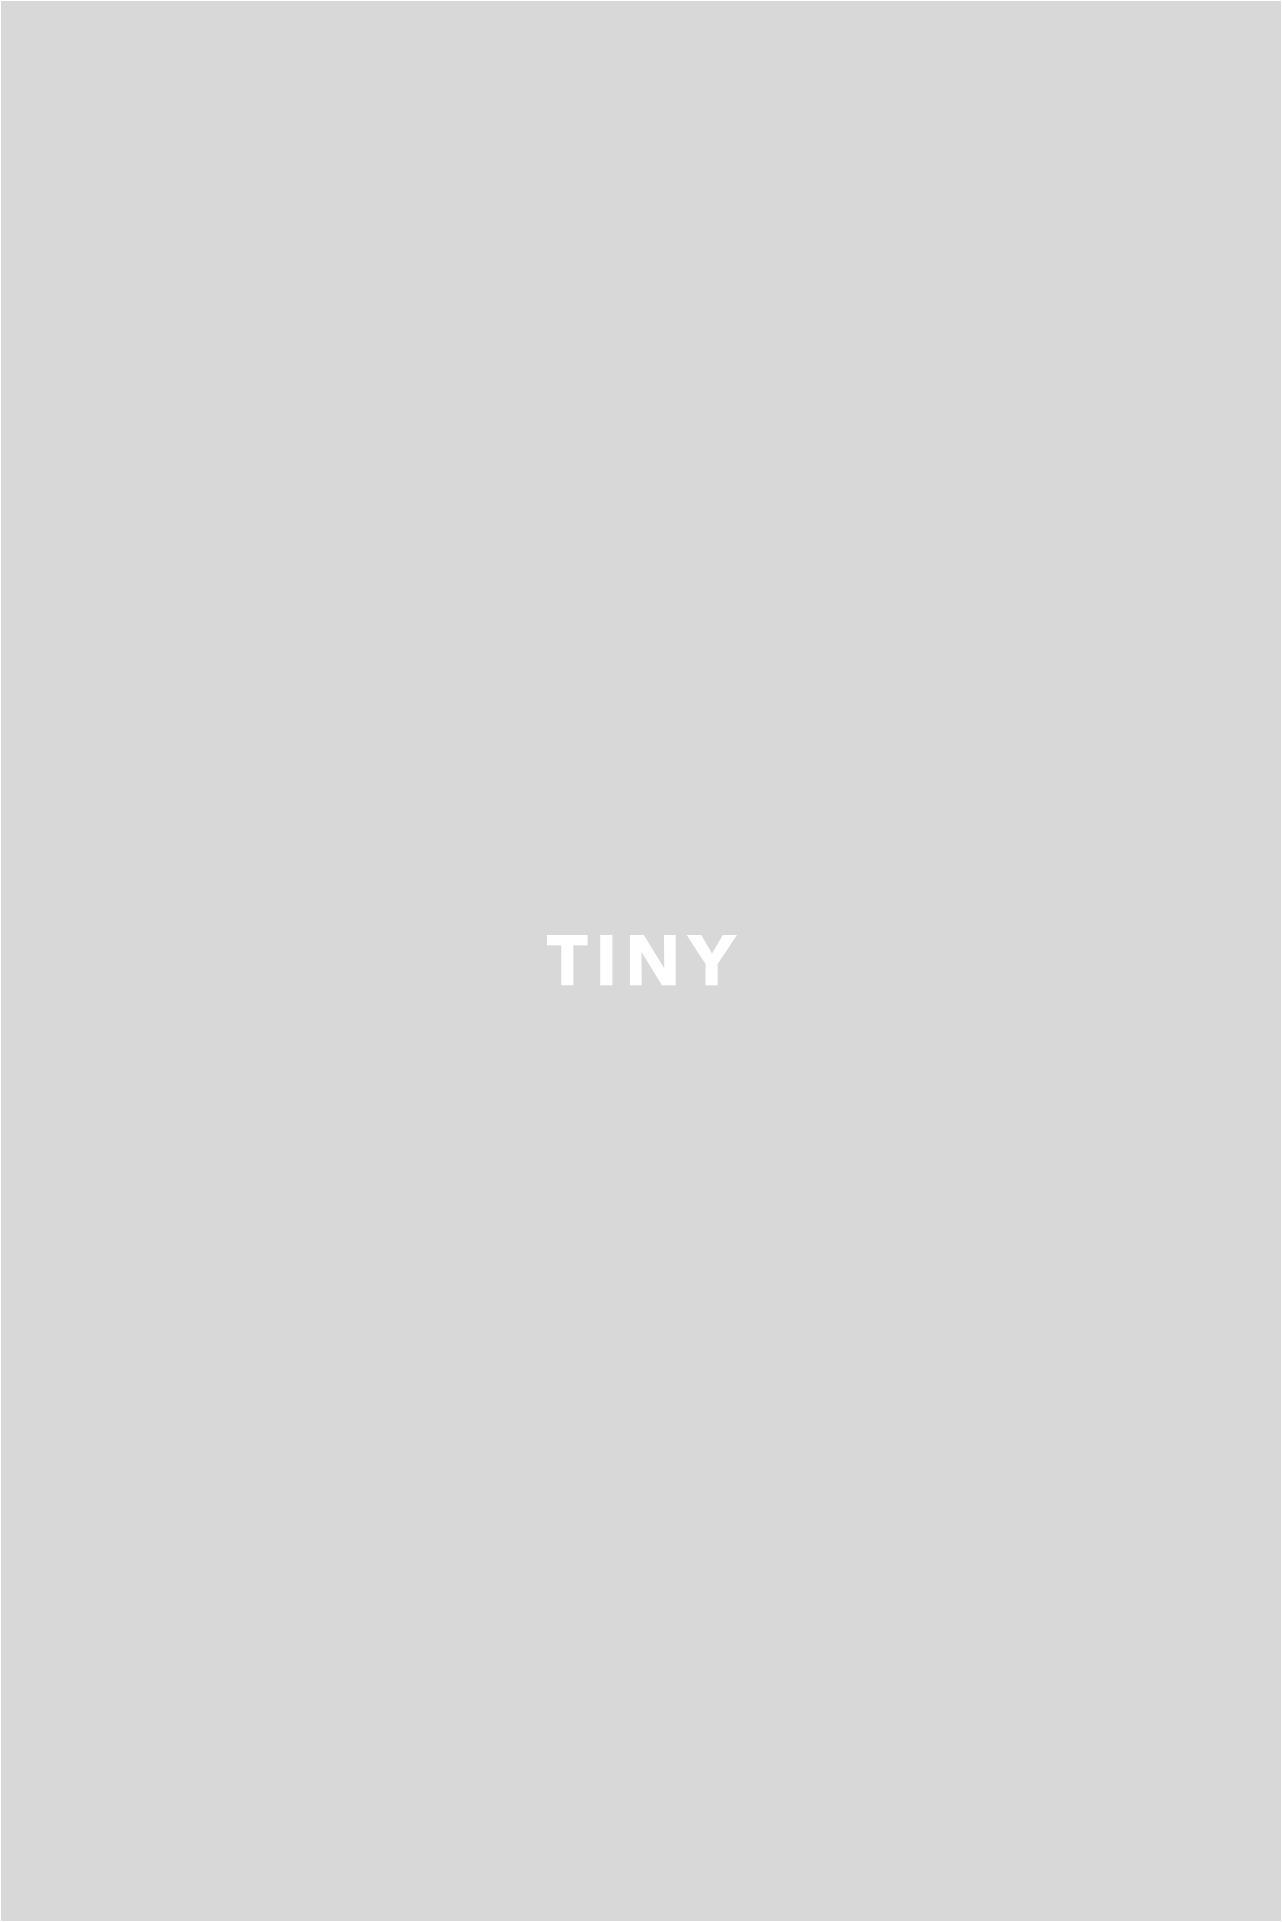 IZIPIZI ADULT F SUN Tortoise Green Lenses +0